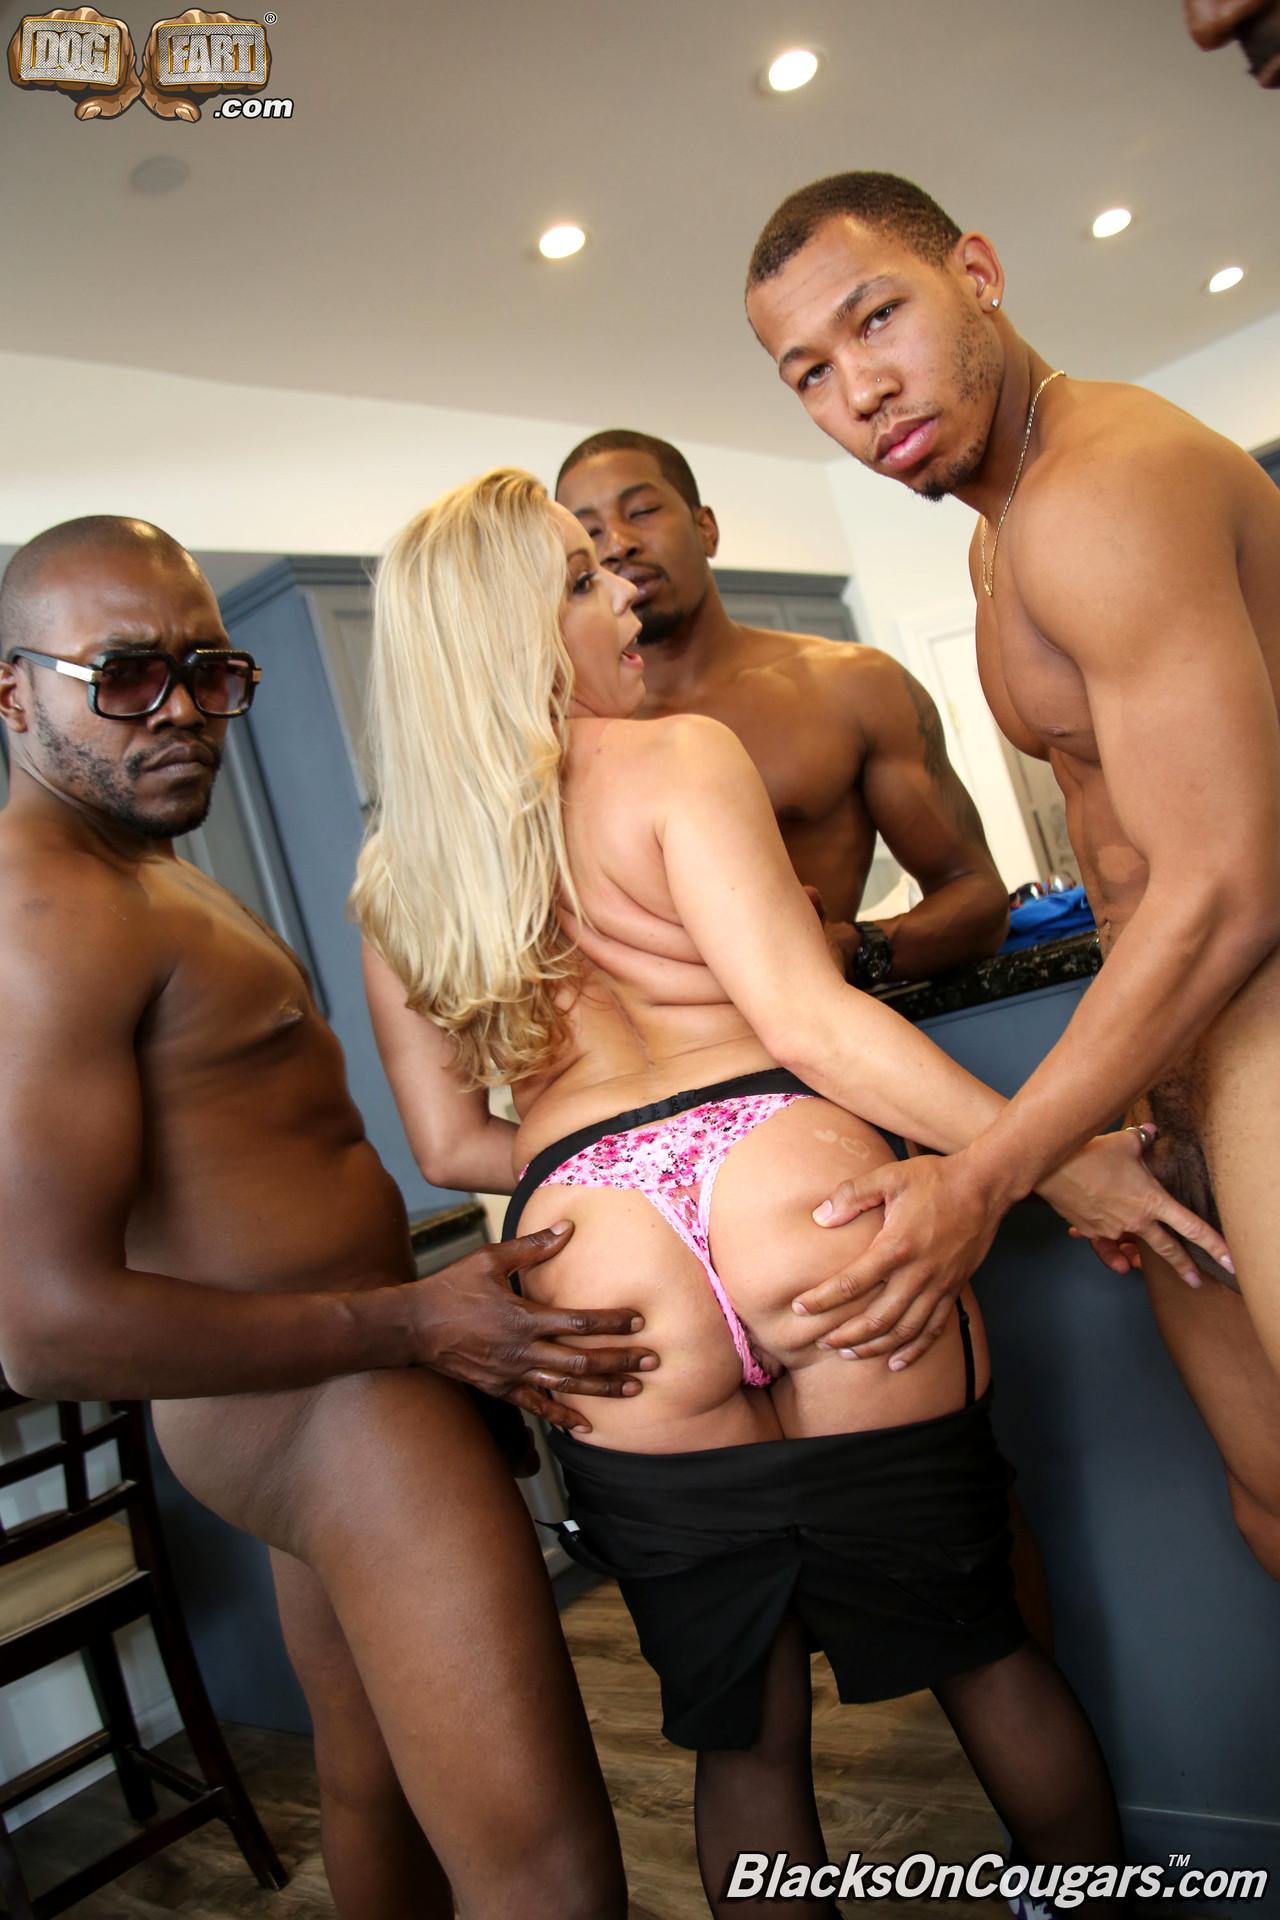 Amber lynn bach blacks on cougars